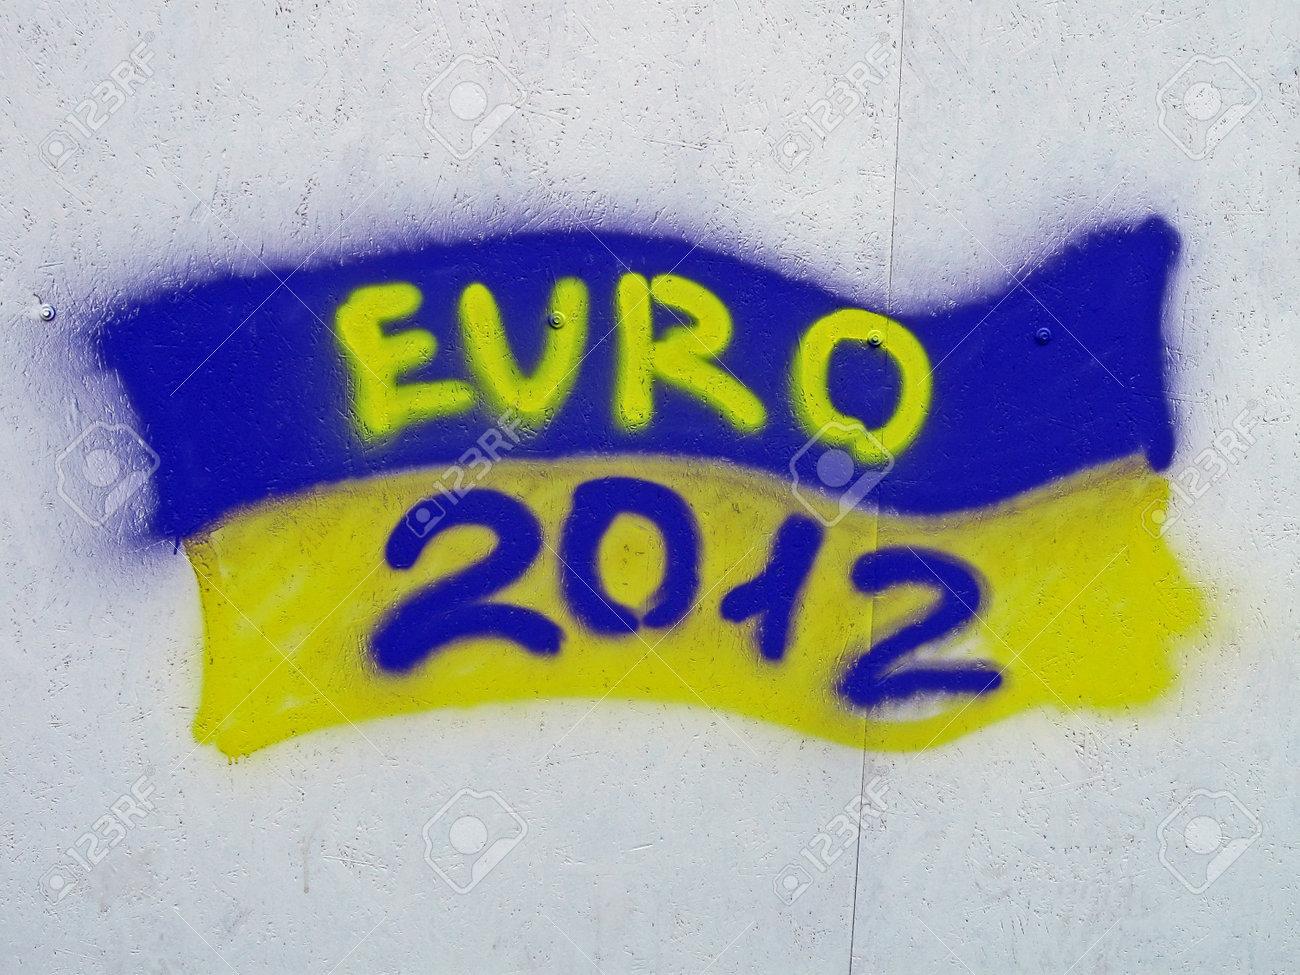 KIEV, UKRAINE - JUNE 19: Ukrainian flag with EURO 2012 text as graffiti on June 19, 2012 in Kiev, UKRAINE. EURO 2012 football championship started on June 08 in Ukraine, Poland.  Stock Photo - 14145925